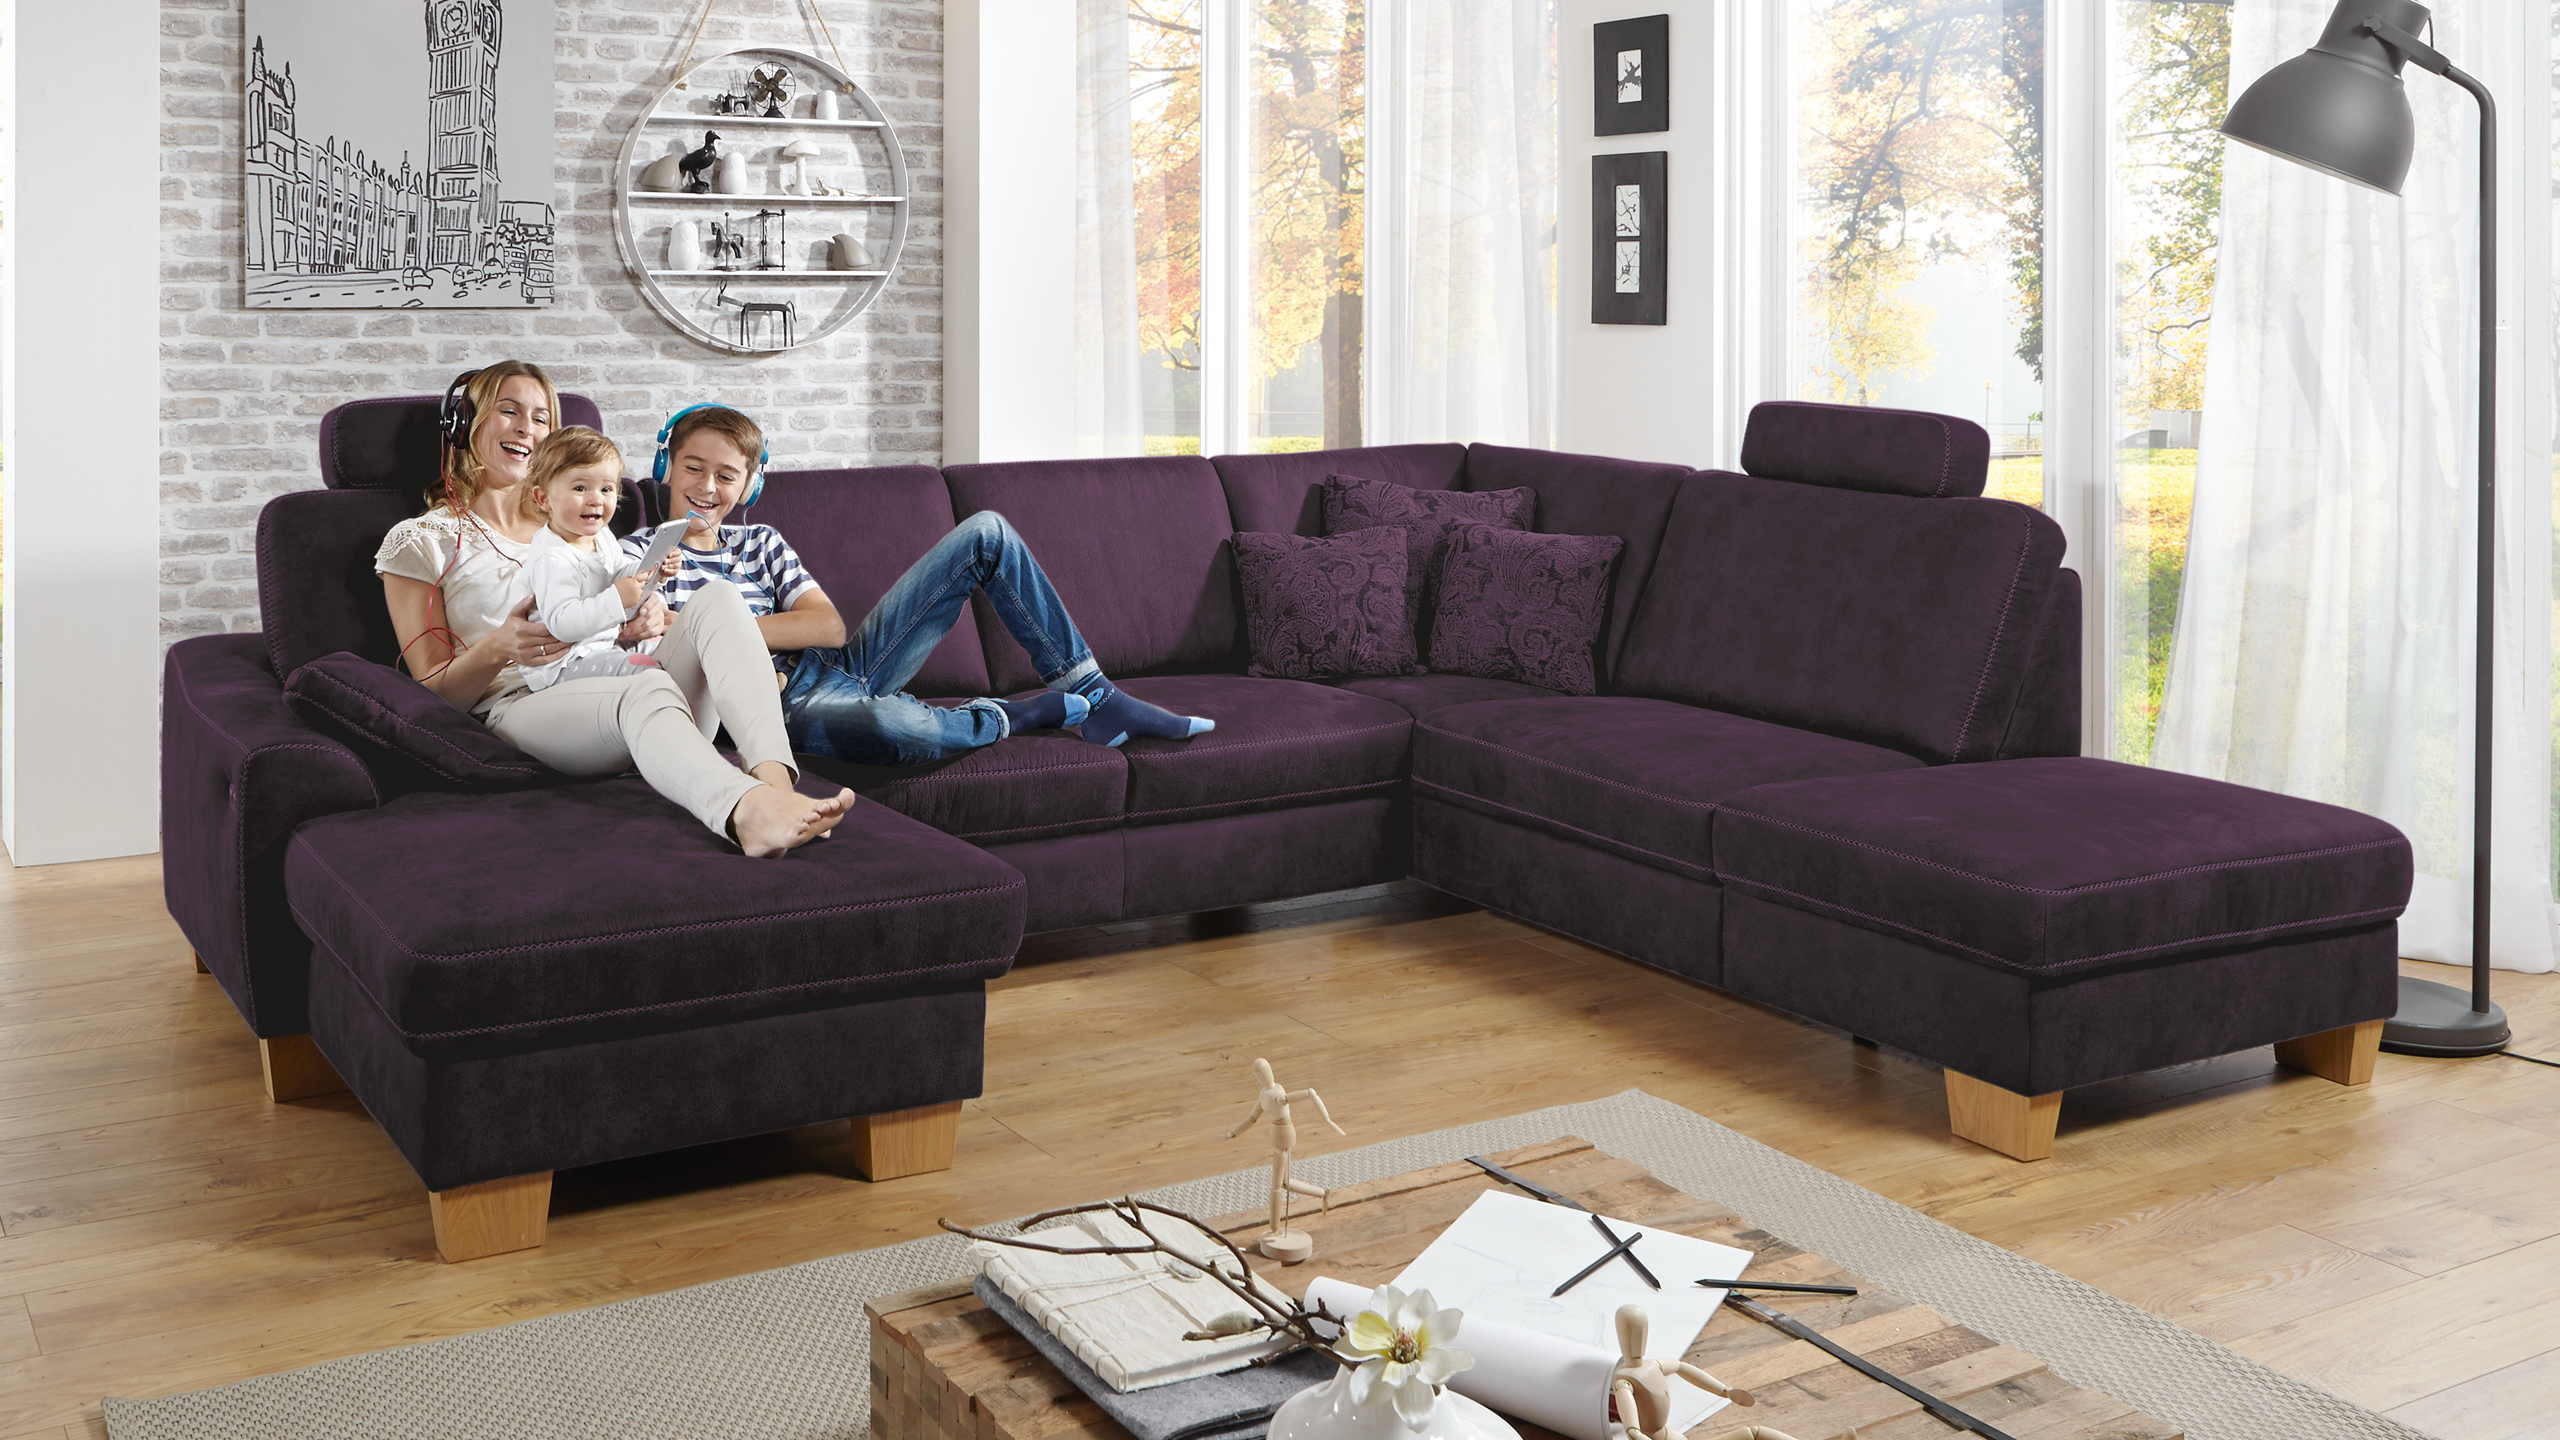 SC family/ select 1028 Wohnlandschaft Lila